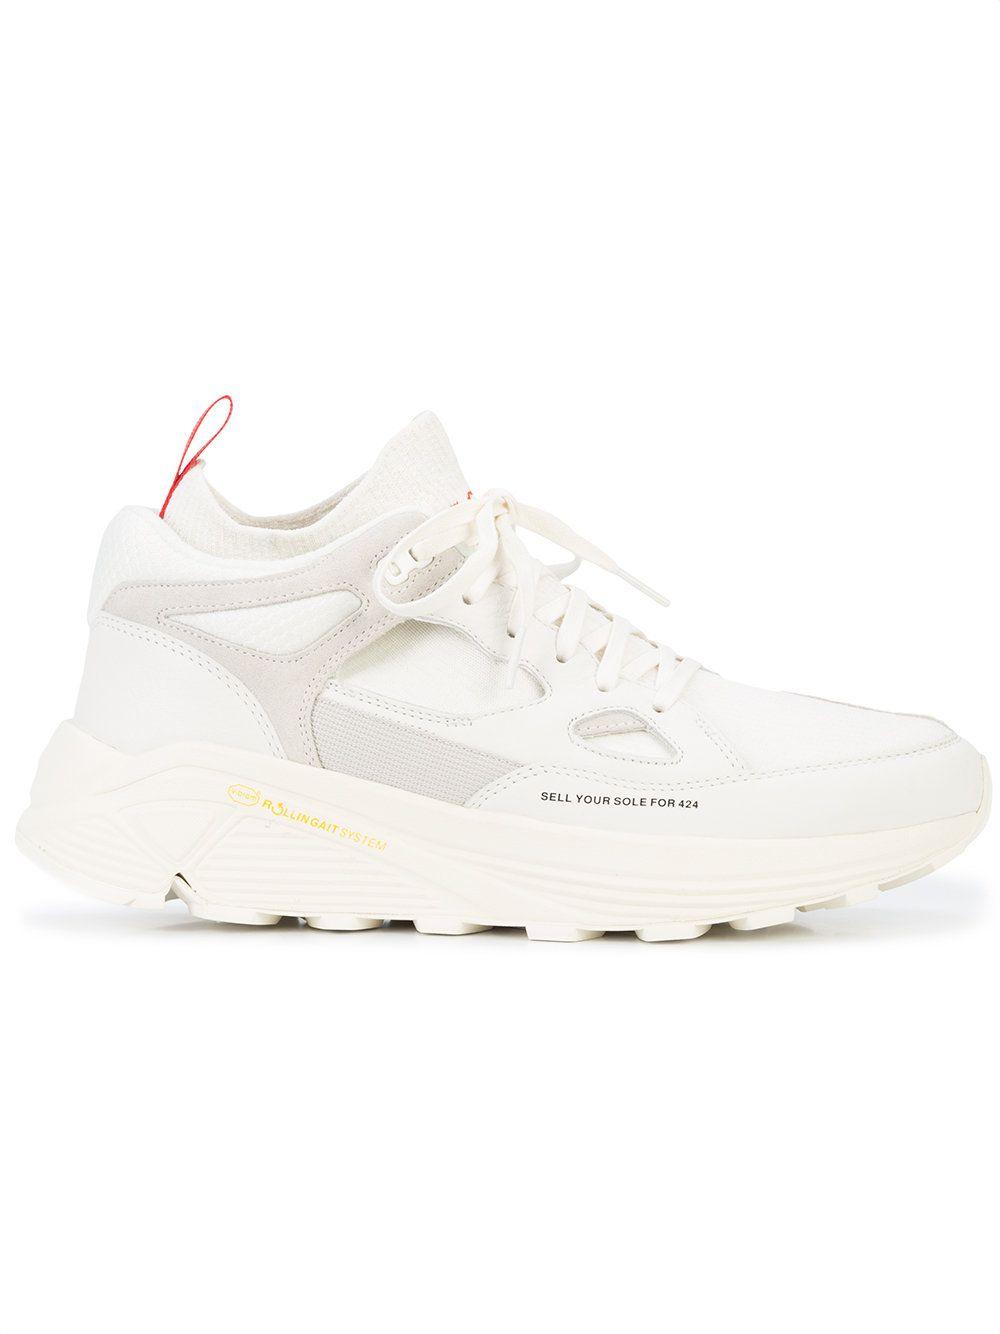 best service 5e66e 18d5f 424 FAIRFAX . 424fairfax shoes